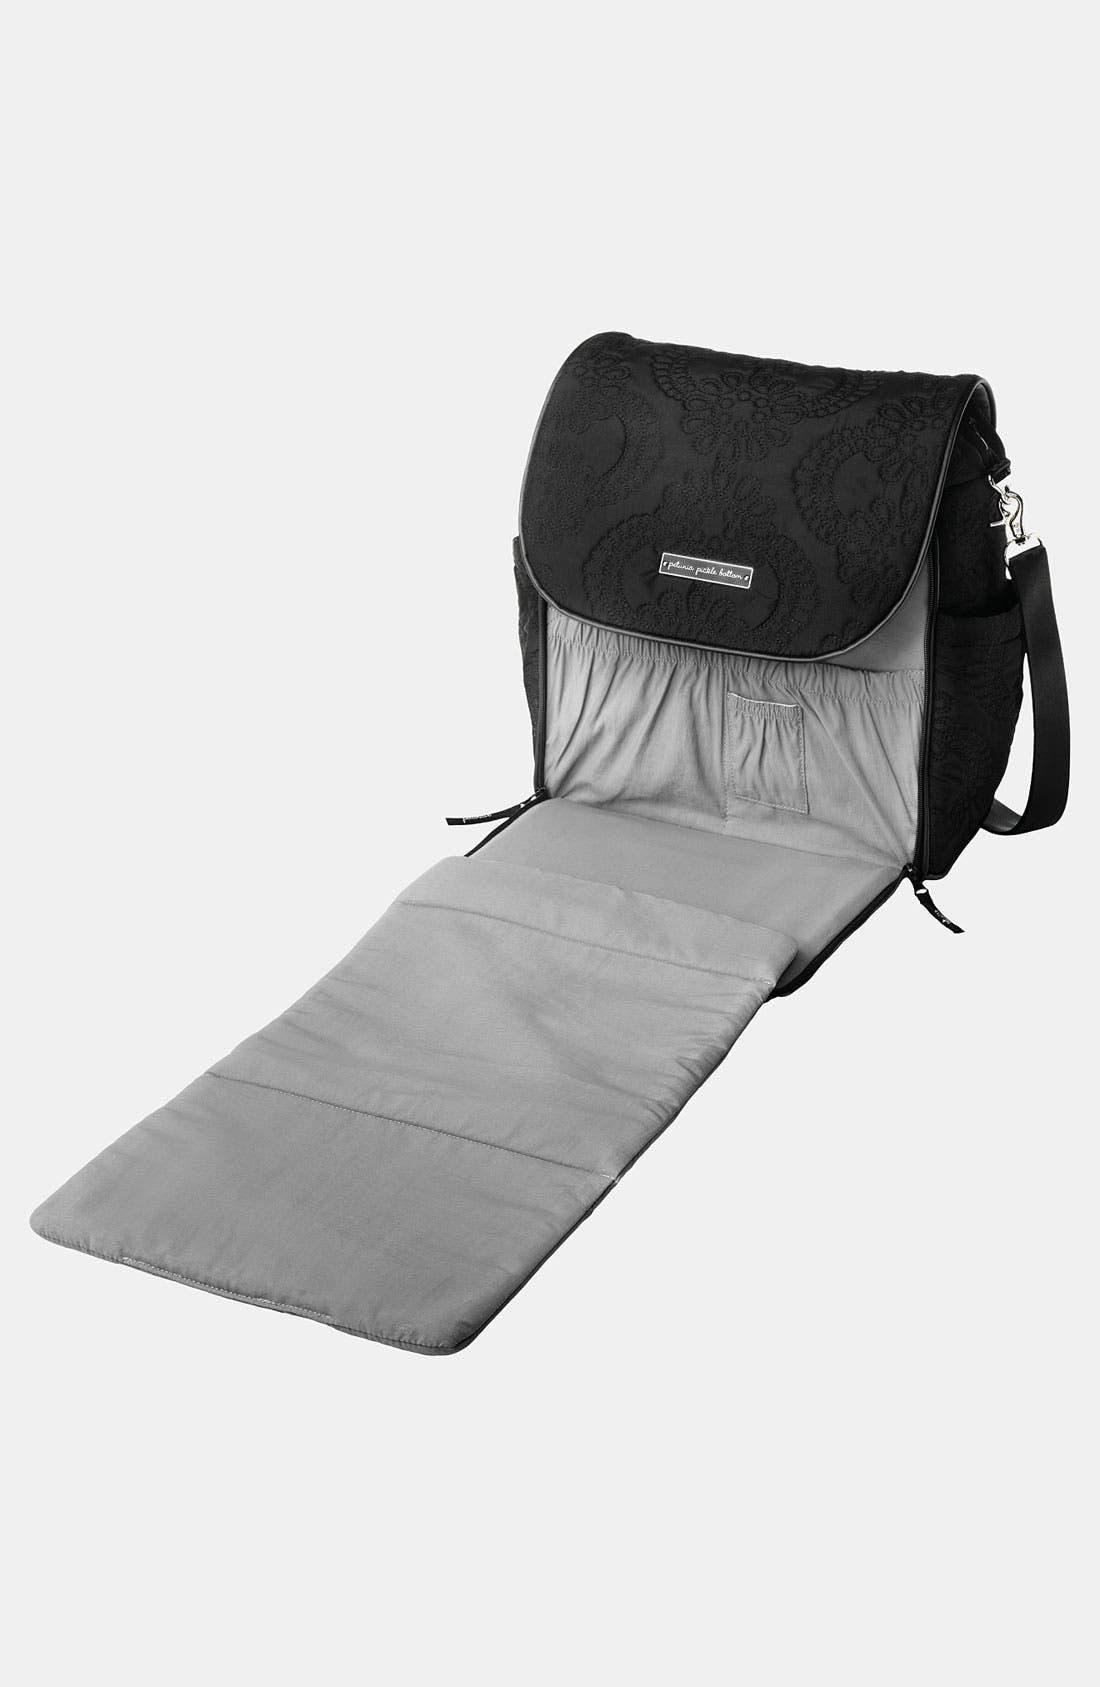 PETUNIA PICKLE BOTTOM,                             'Embossed Boxy' Magnetic Closure Backpack Diaper Bag,                             Alternate thumbnail 3, color,                             001